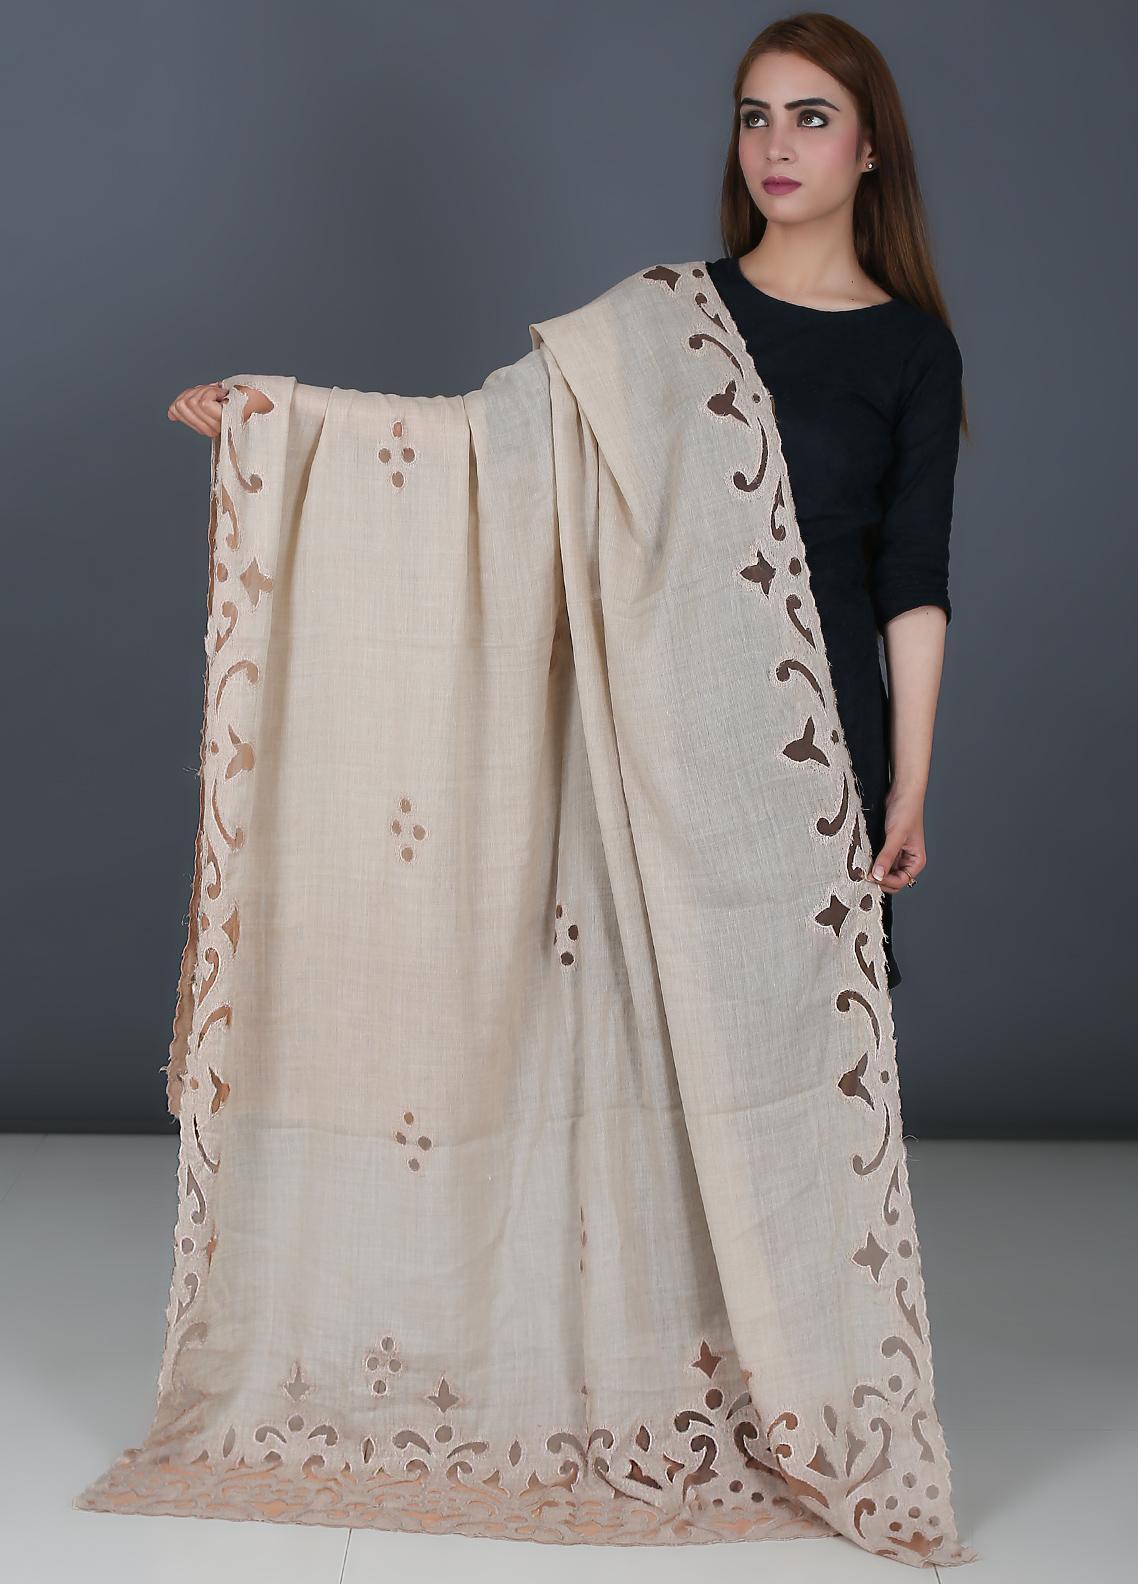 Sanaulla Exclusive Range Cutwork Pashmina  Shawl 562 Beige - Kashmiri Shawls